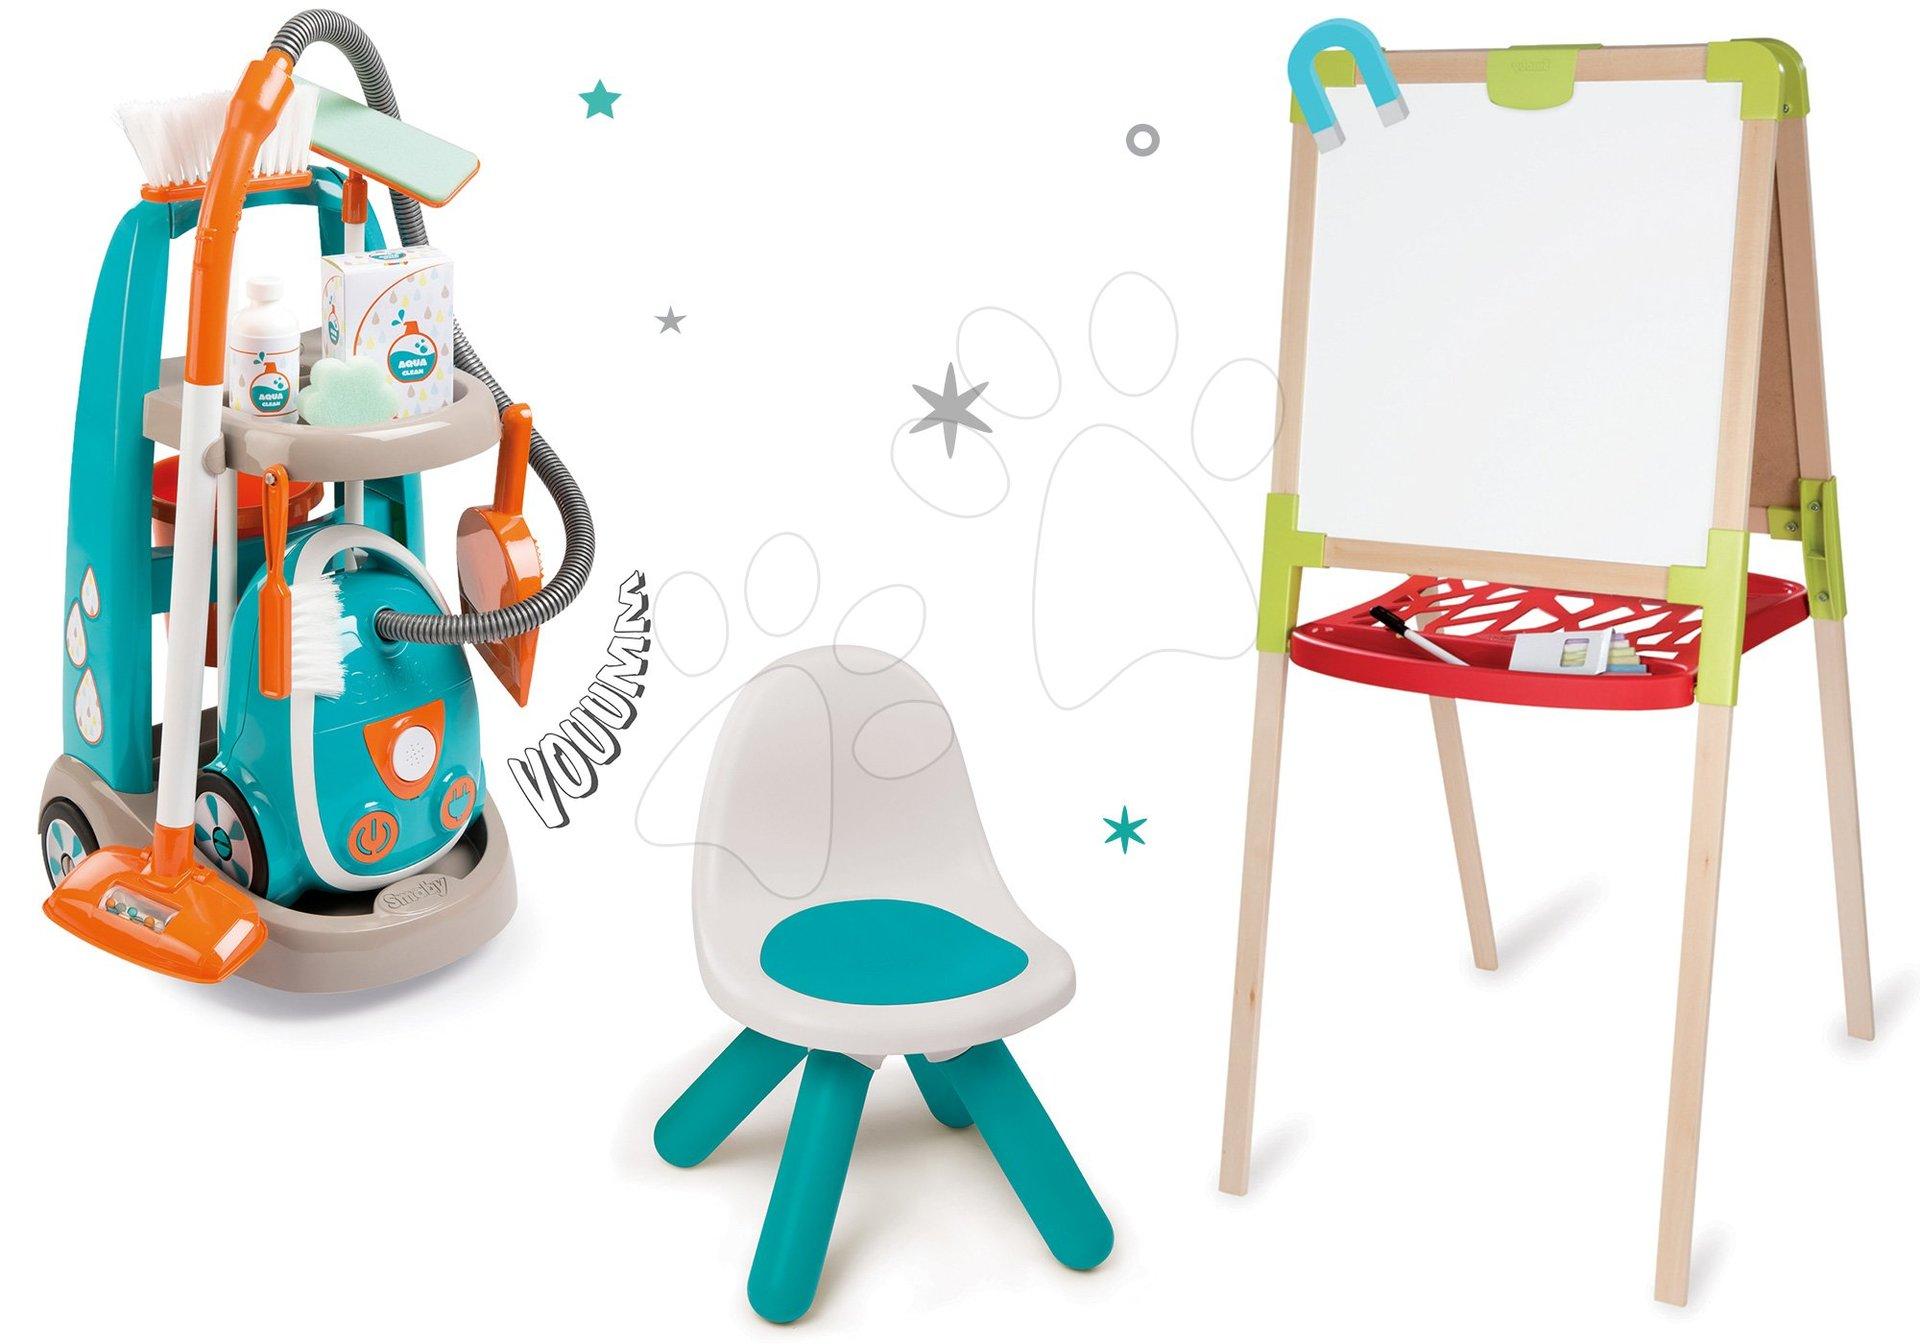 Hry na domácnosť - Set upratovací vozík s elektronickým vysávačom Vacuum Cleaner Smoby a školská tabuľa obojstranná magnetická so stoličkou